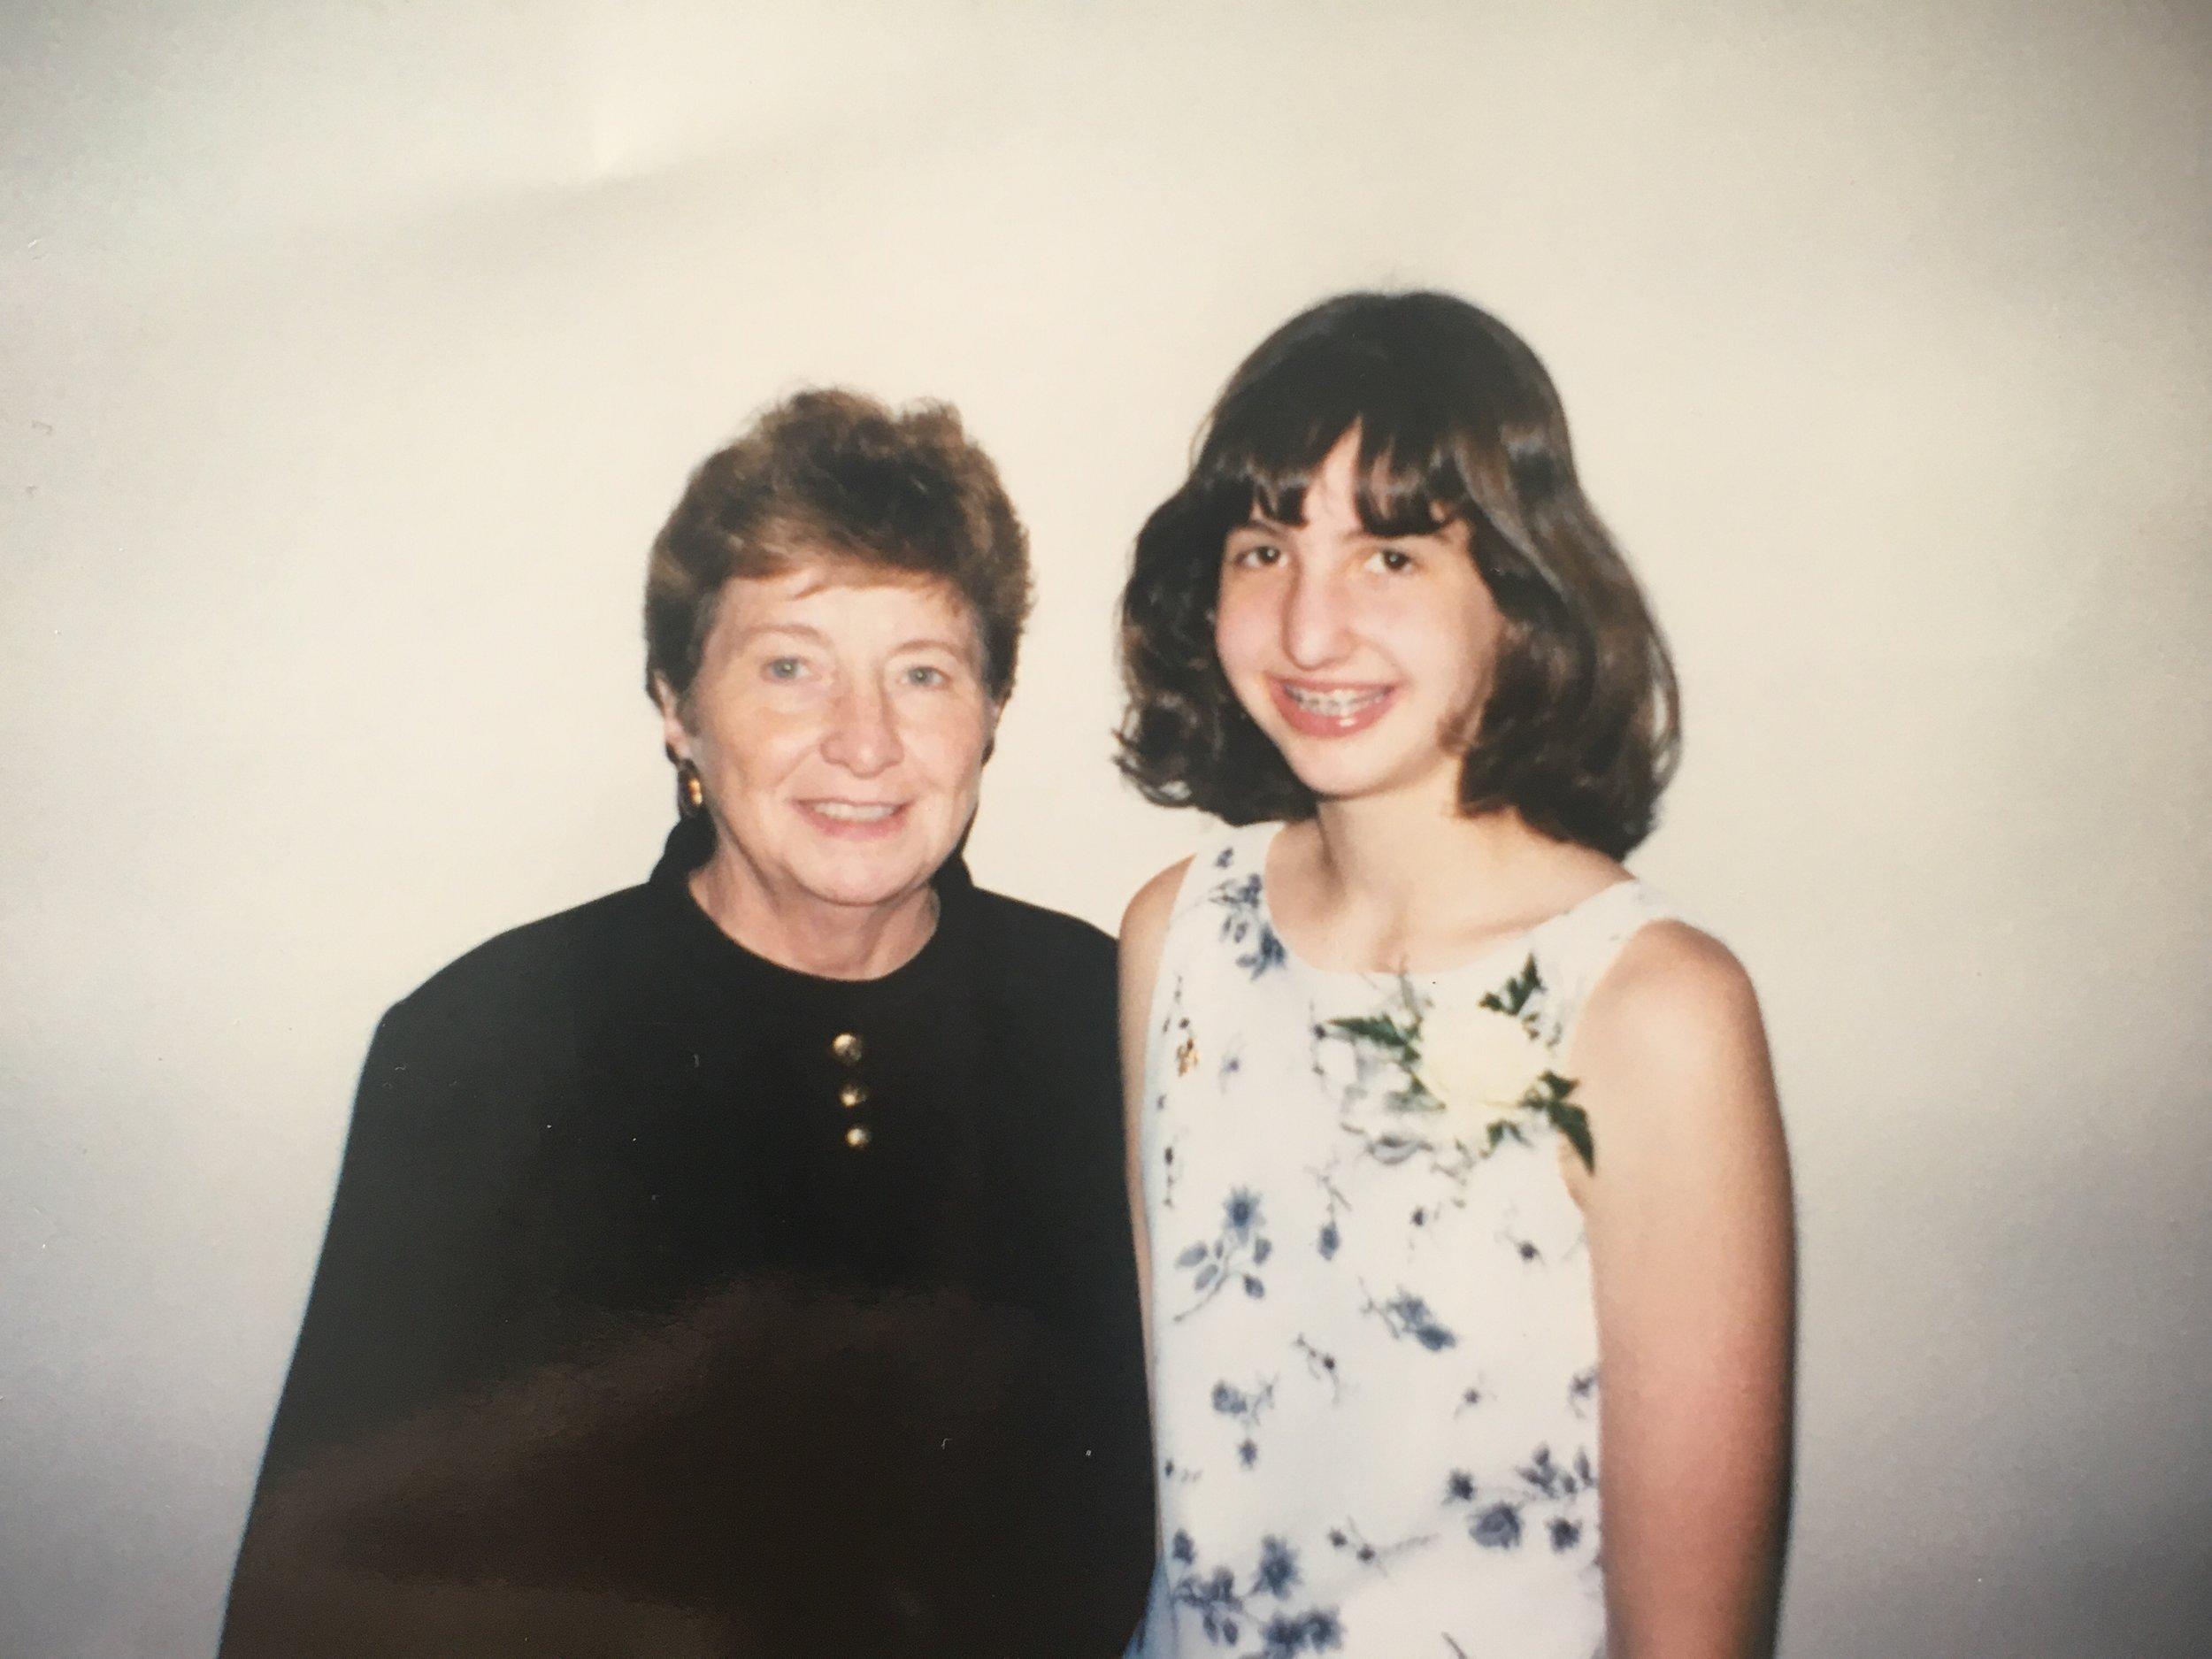 my grandma & me at my 8th-grade confirmation